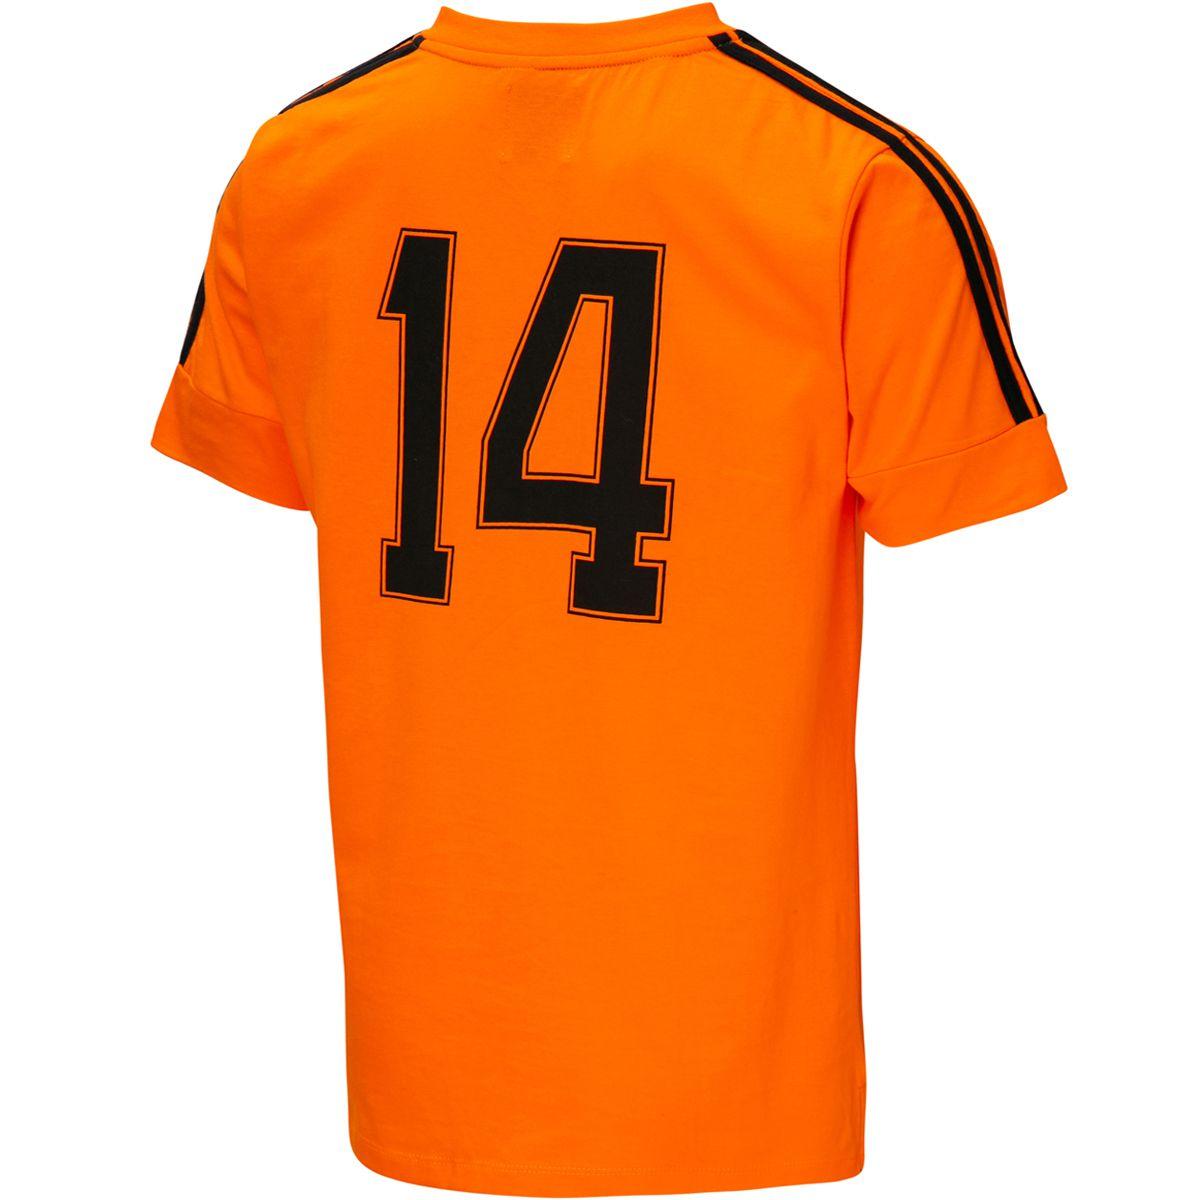 Camisa Holanda Retrô 1974 Cruyff